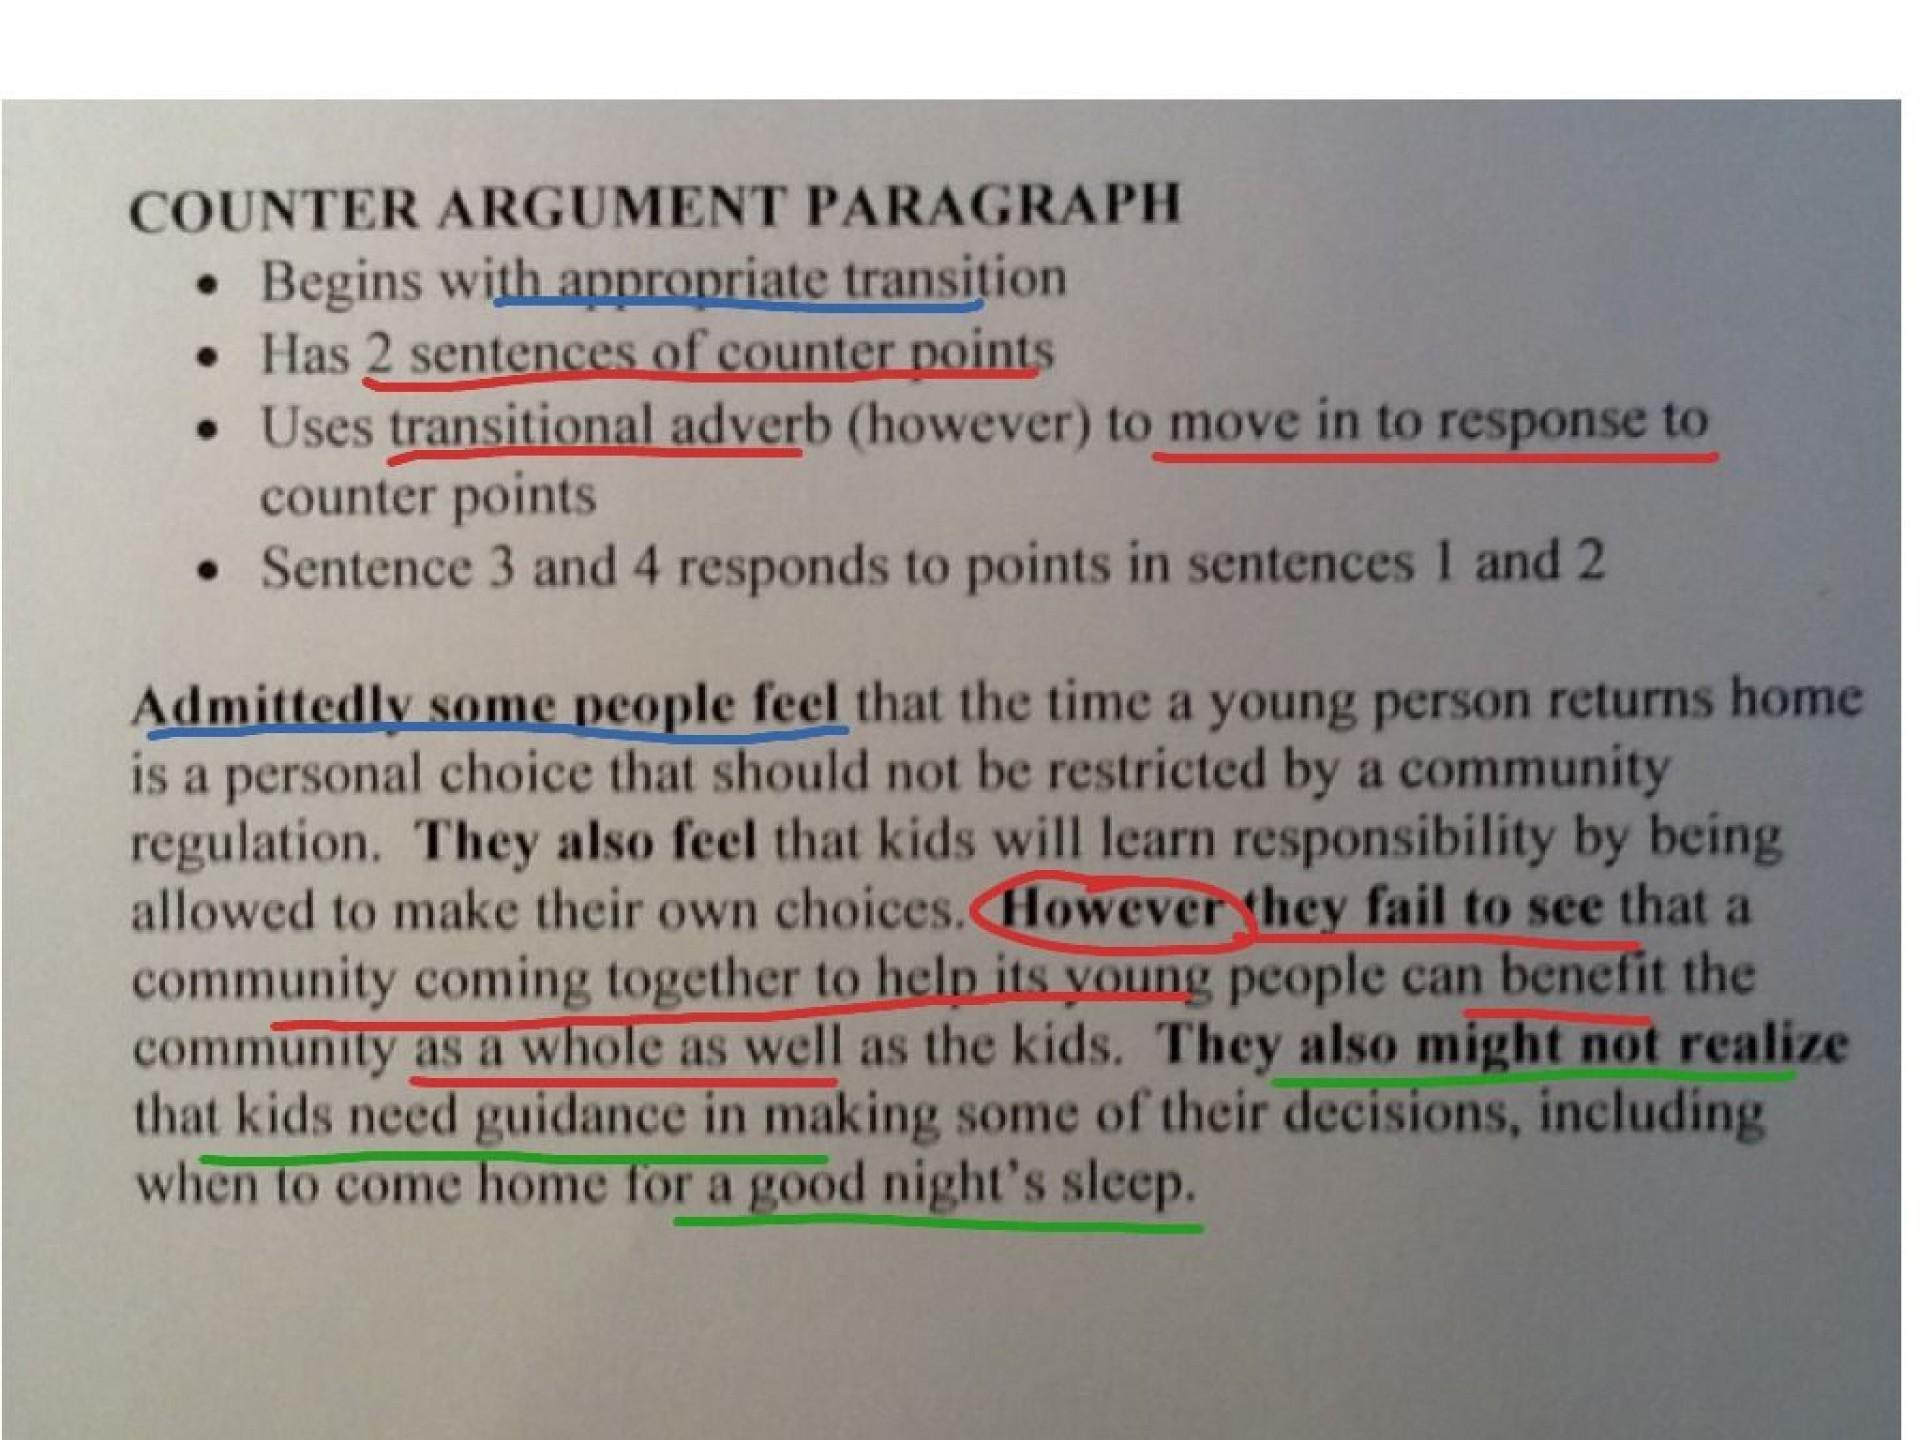 010 Essay Example Counter Beautiful Argument Examples Persuasive Sample 1920